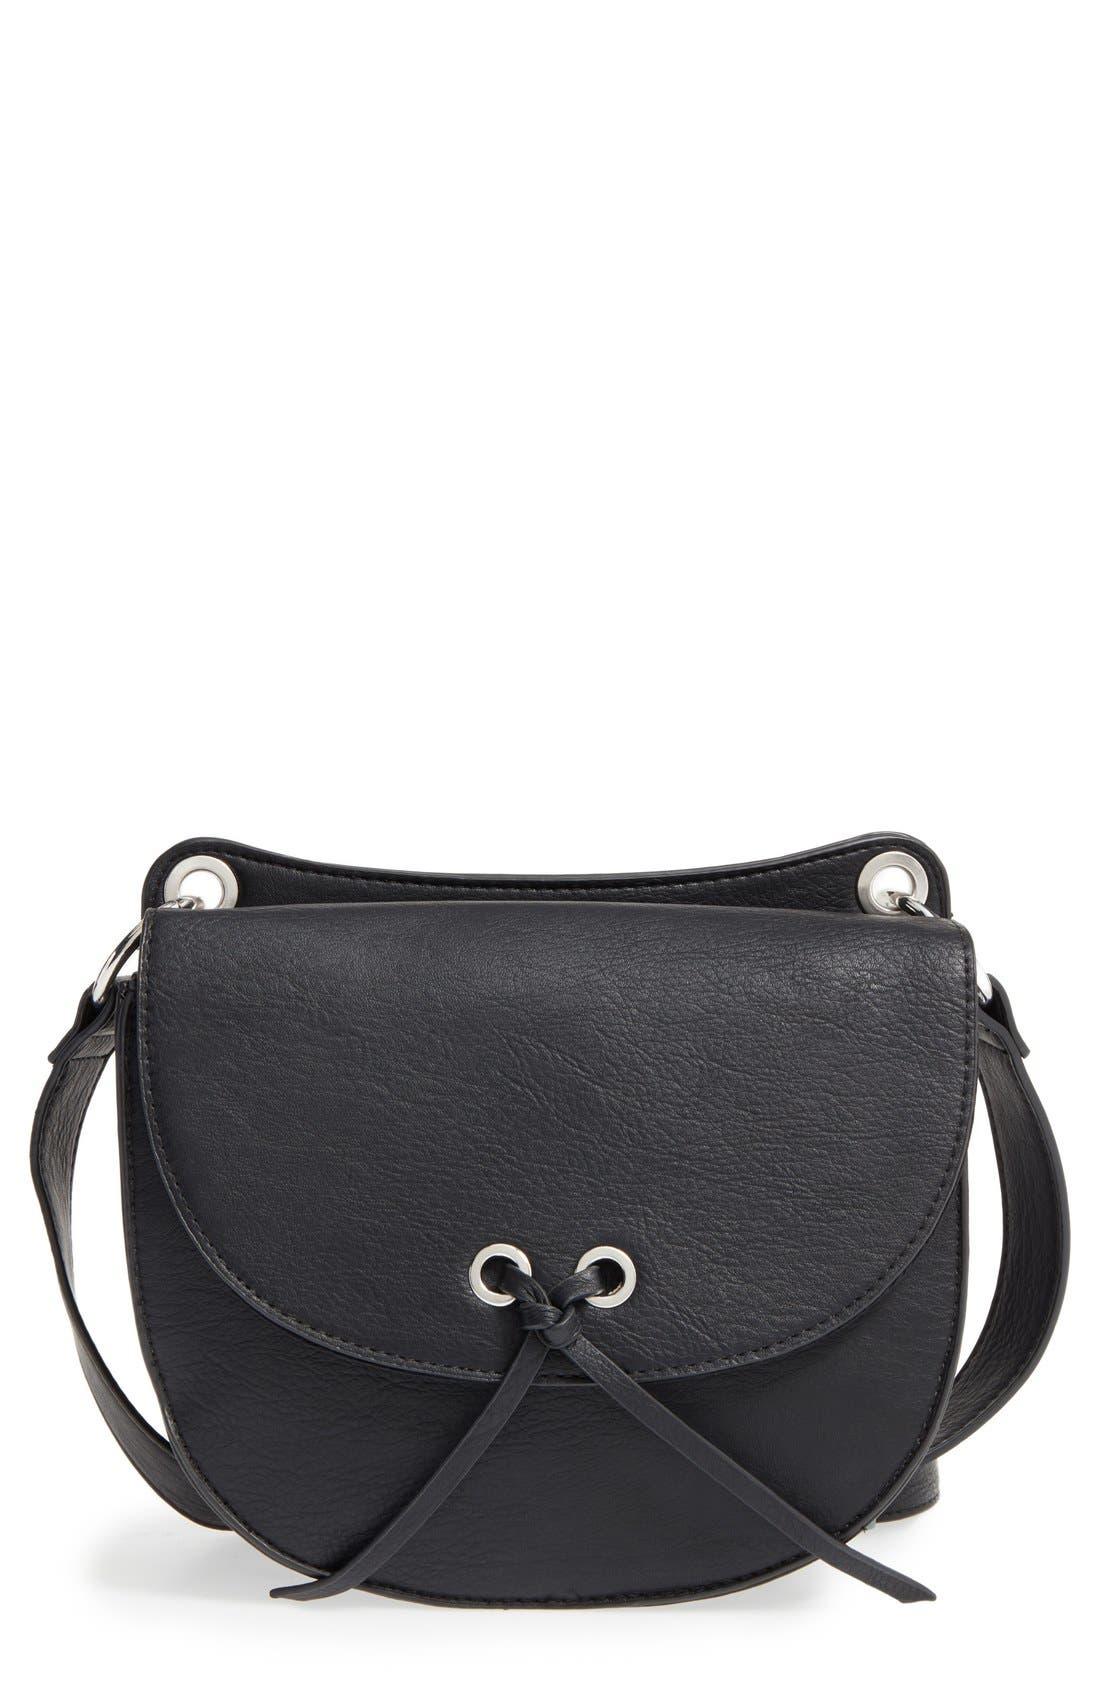 Alternate Image 1 Selected - BP. Faux Leather Crossbody Bag